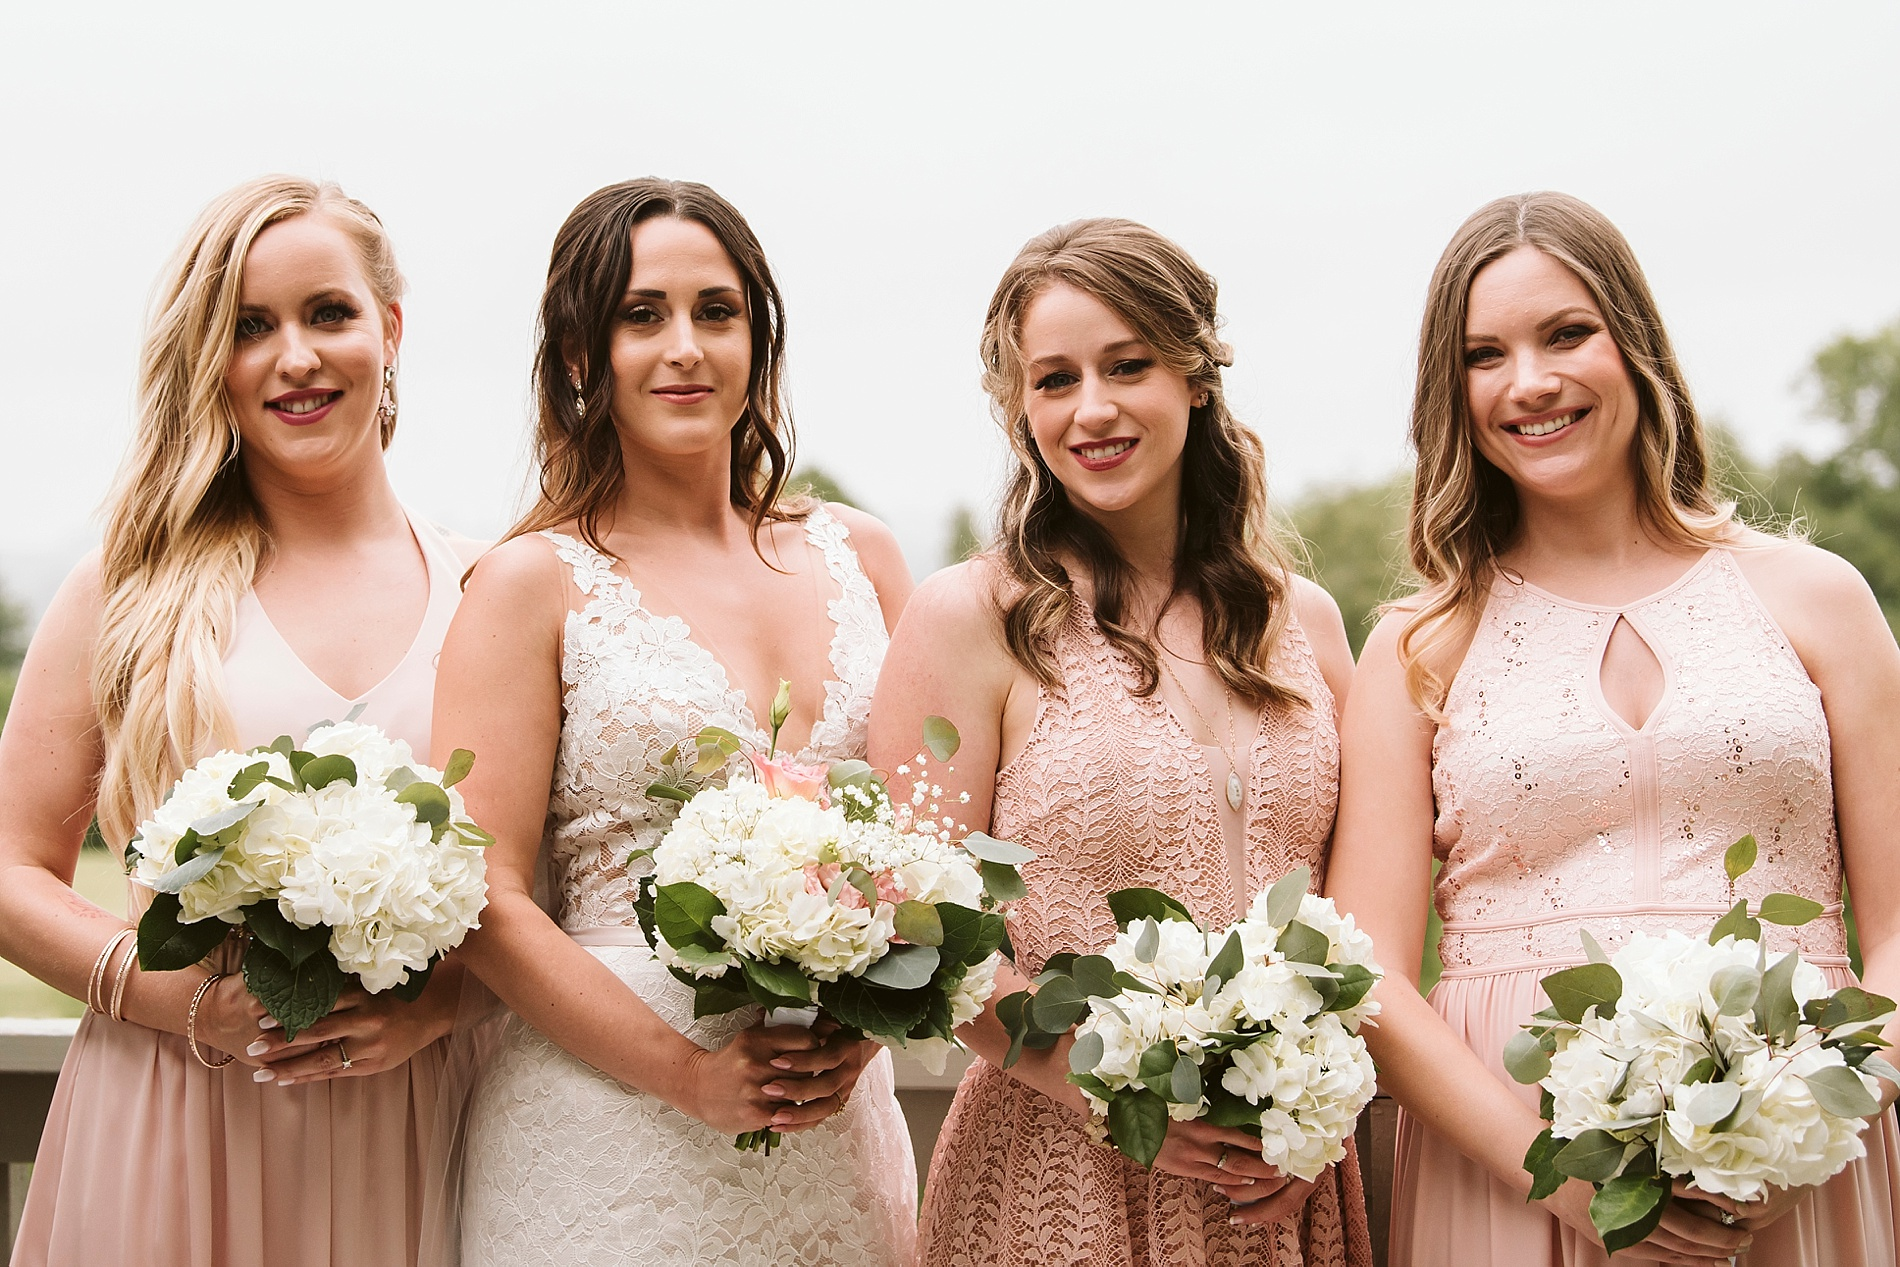 Kawartha_Lakes_Wedding_Bobcageon_Eganridge_Resort_Toronto_Photographer_0020.jpg